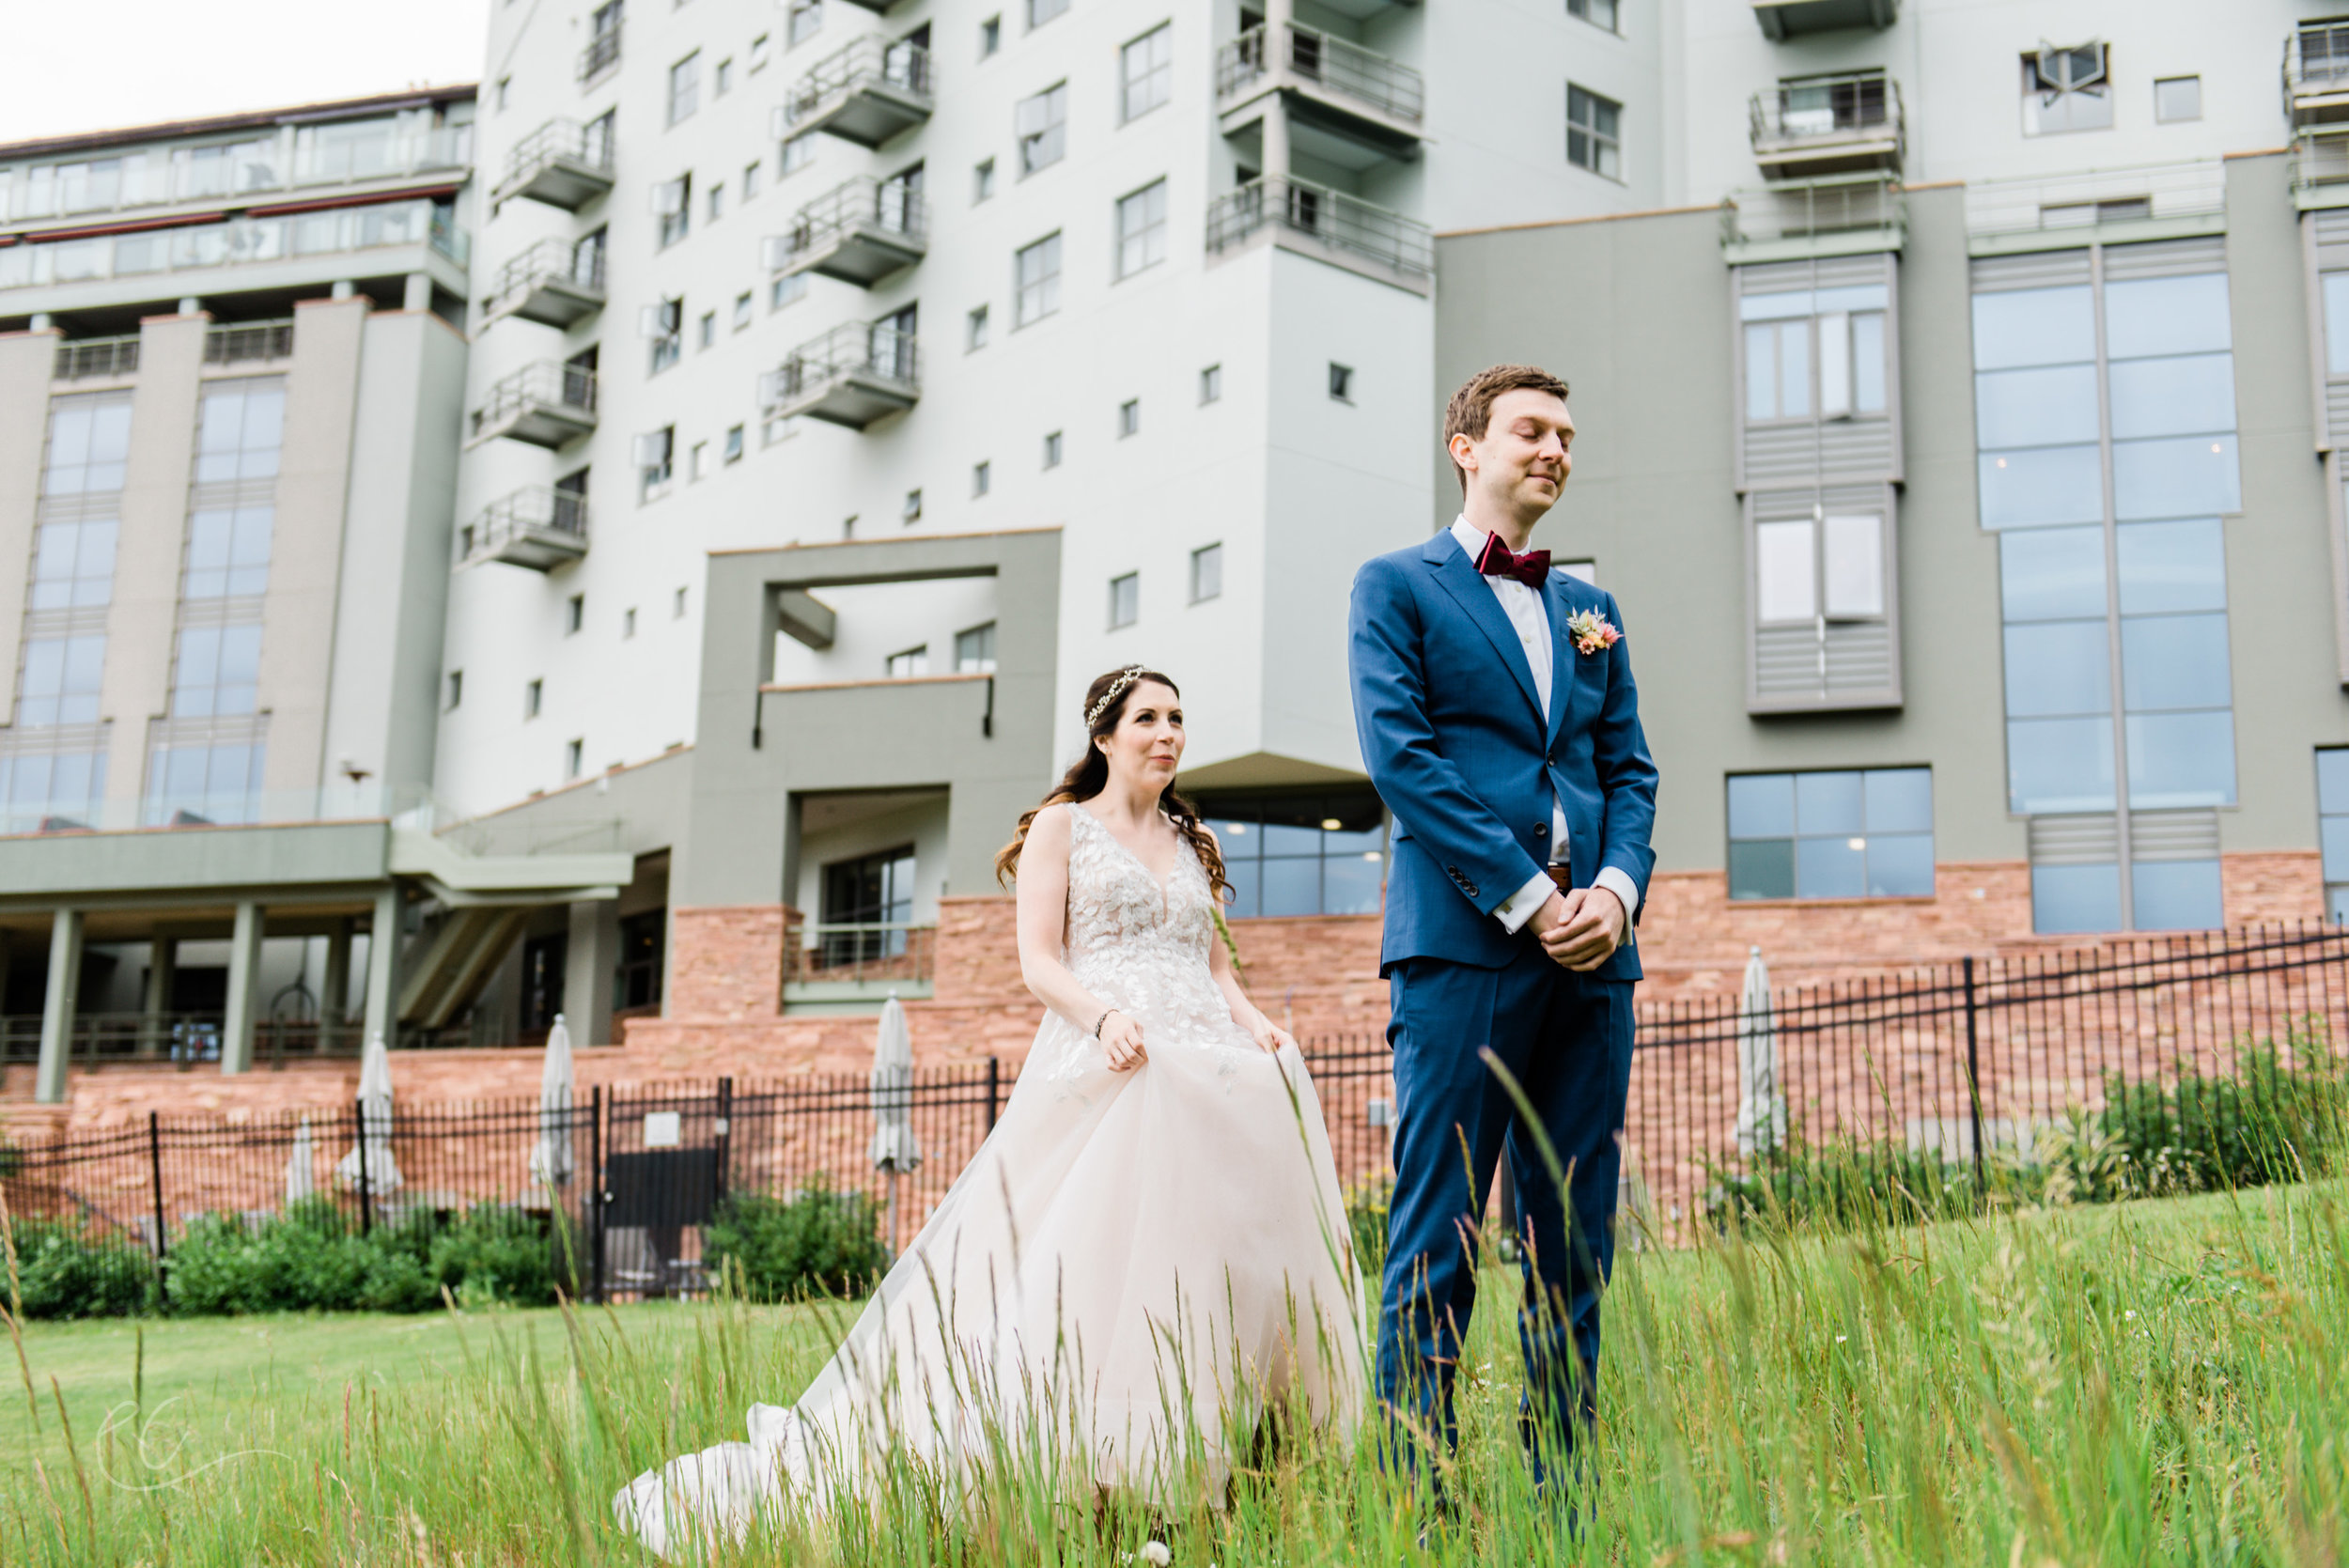 Telluride_wedding_photography-70.jpg